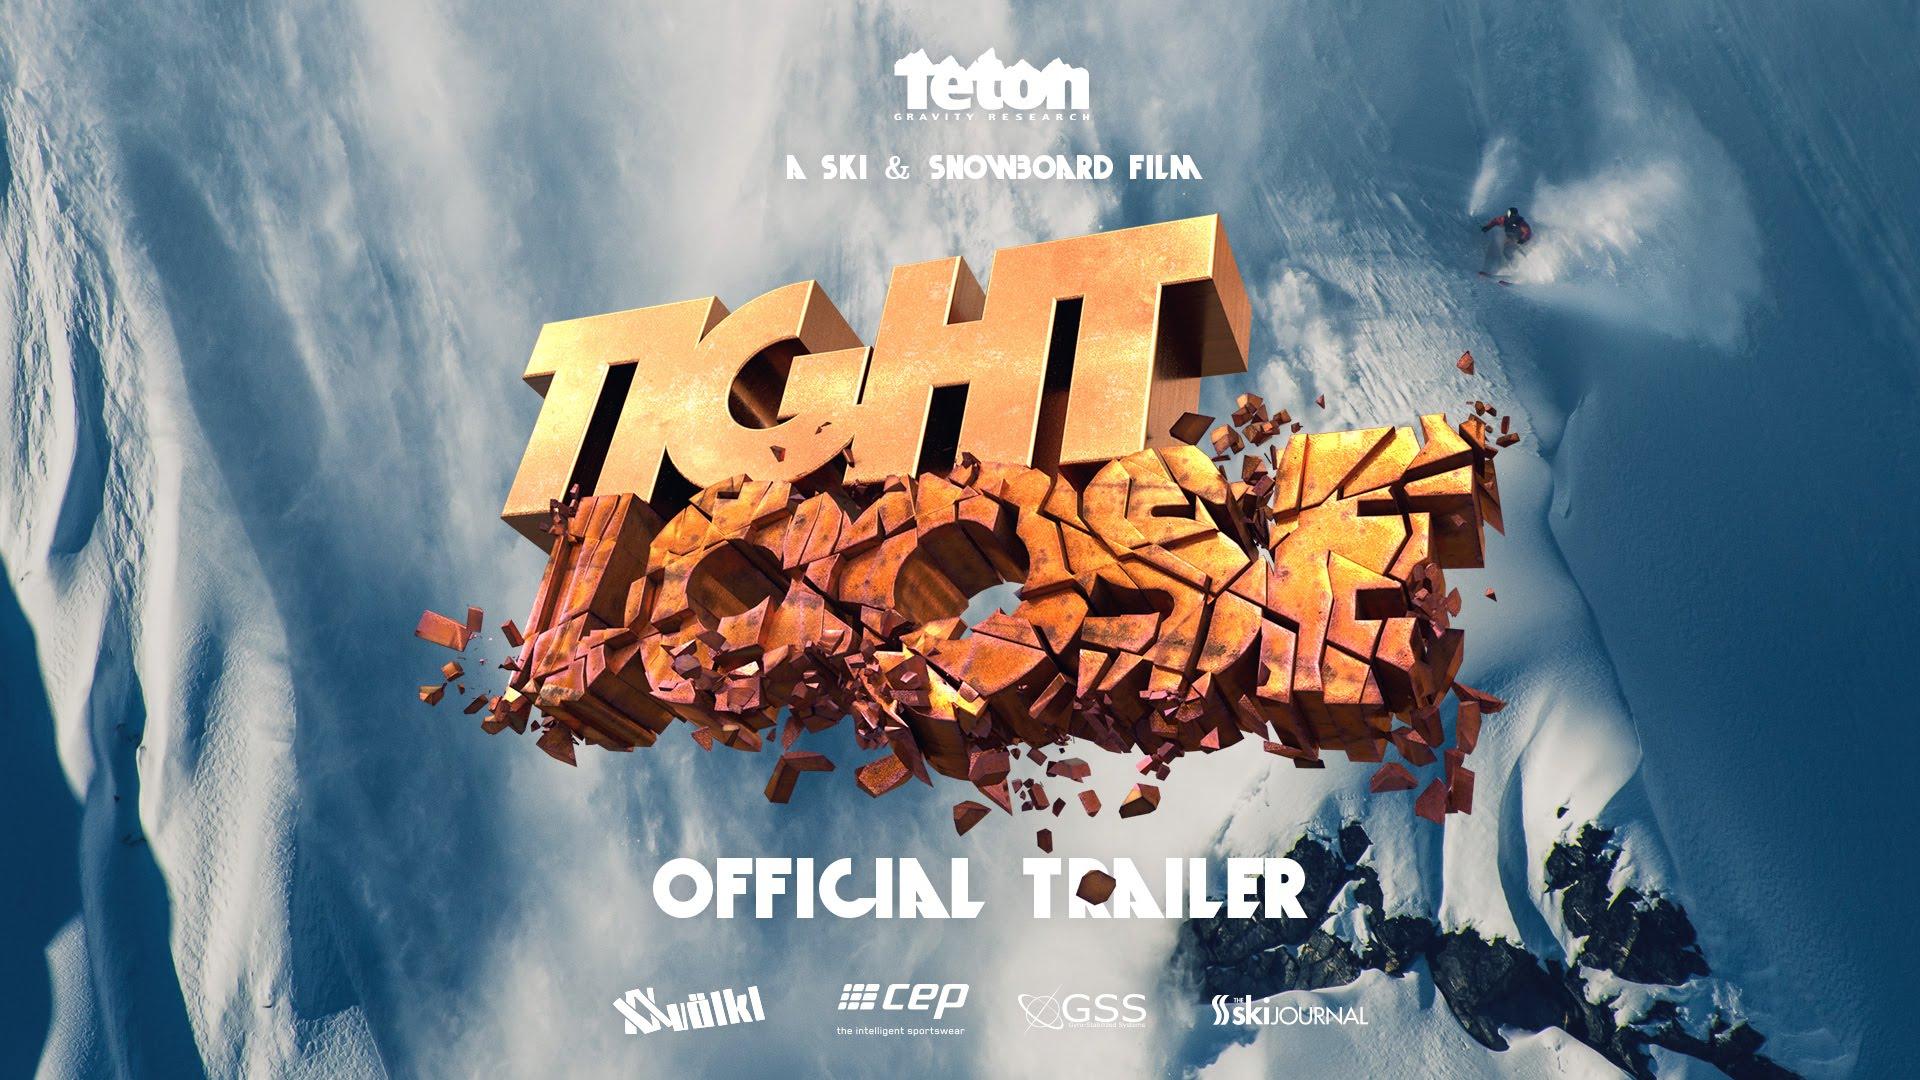 Tight Loose – Official Trailer von TGR